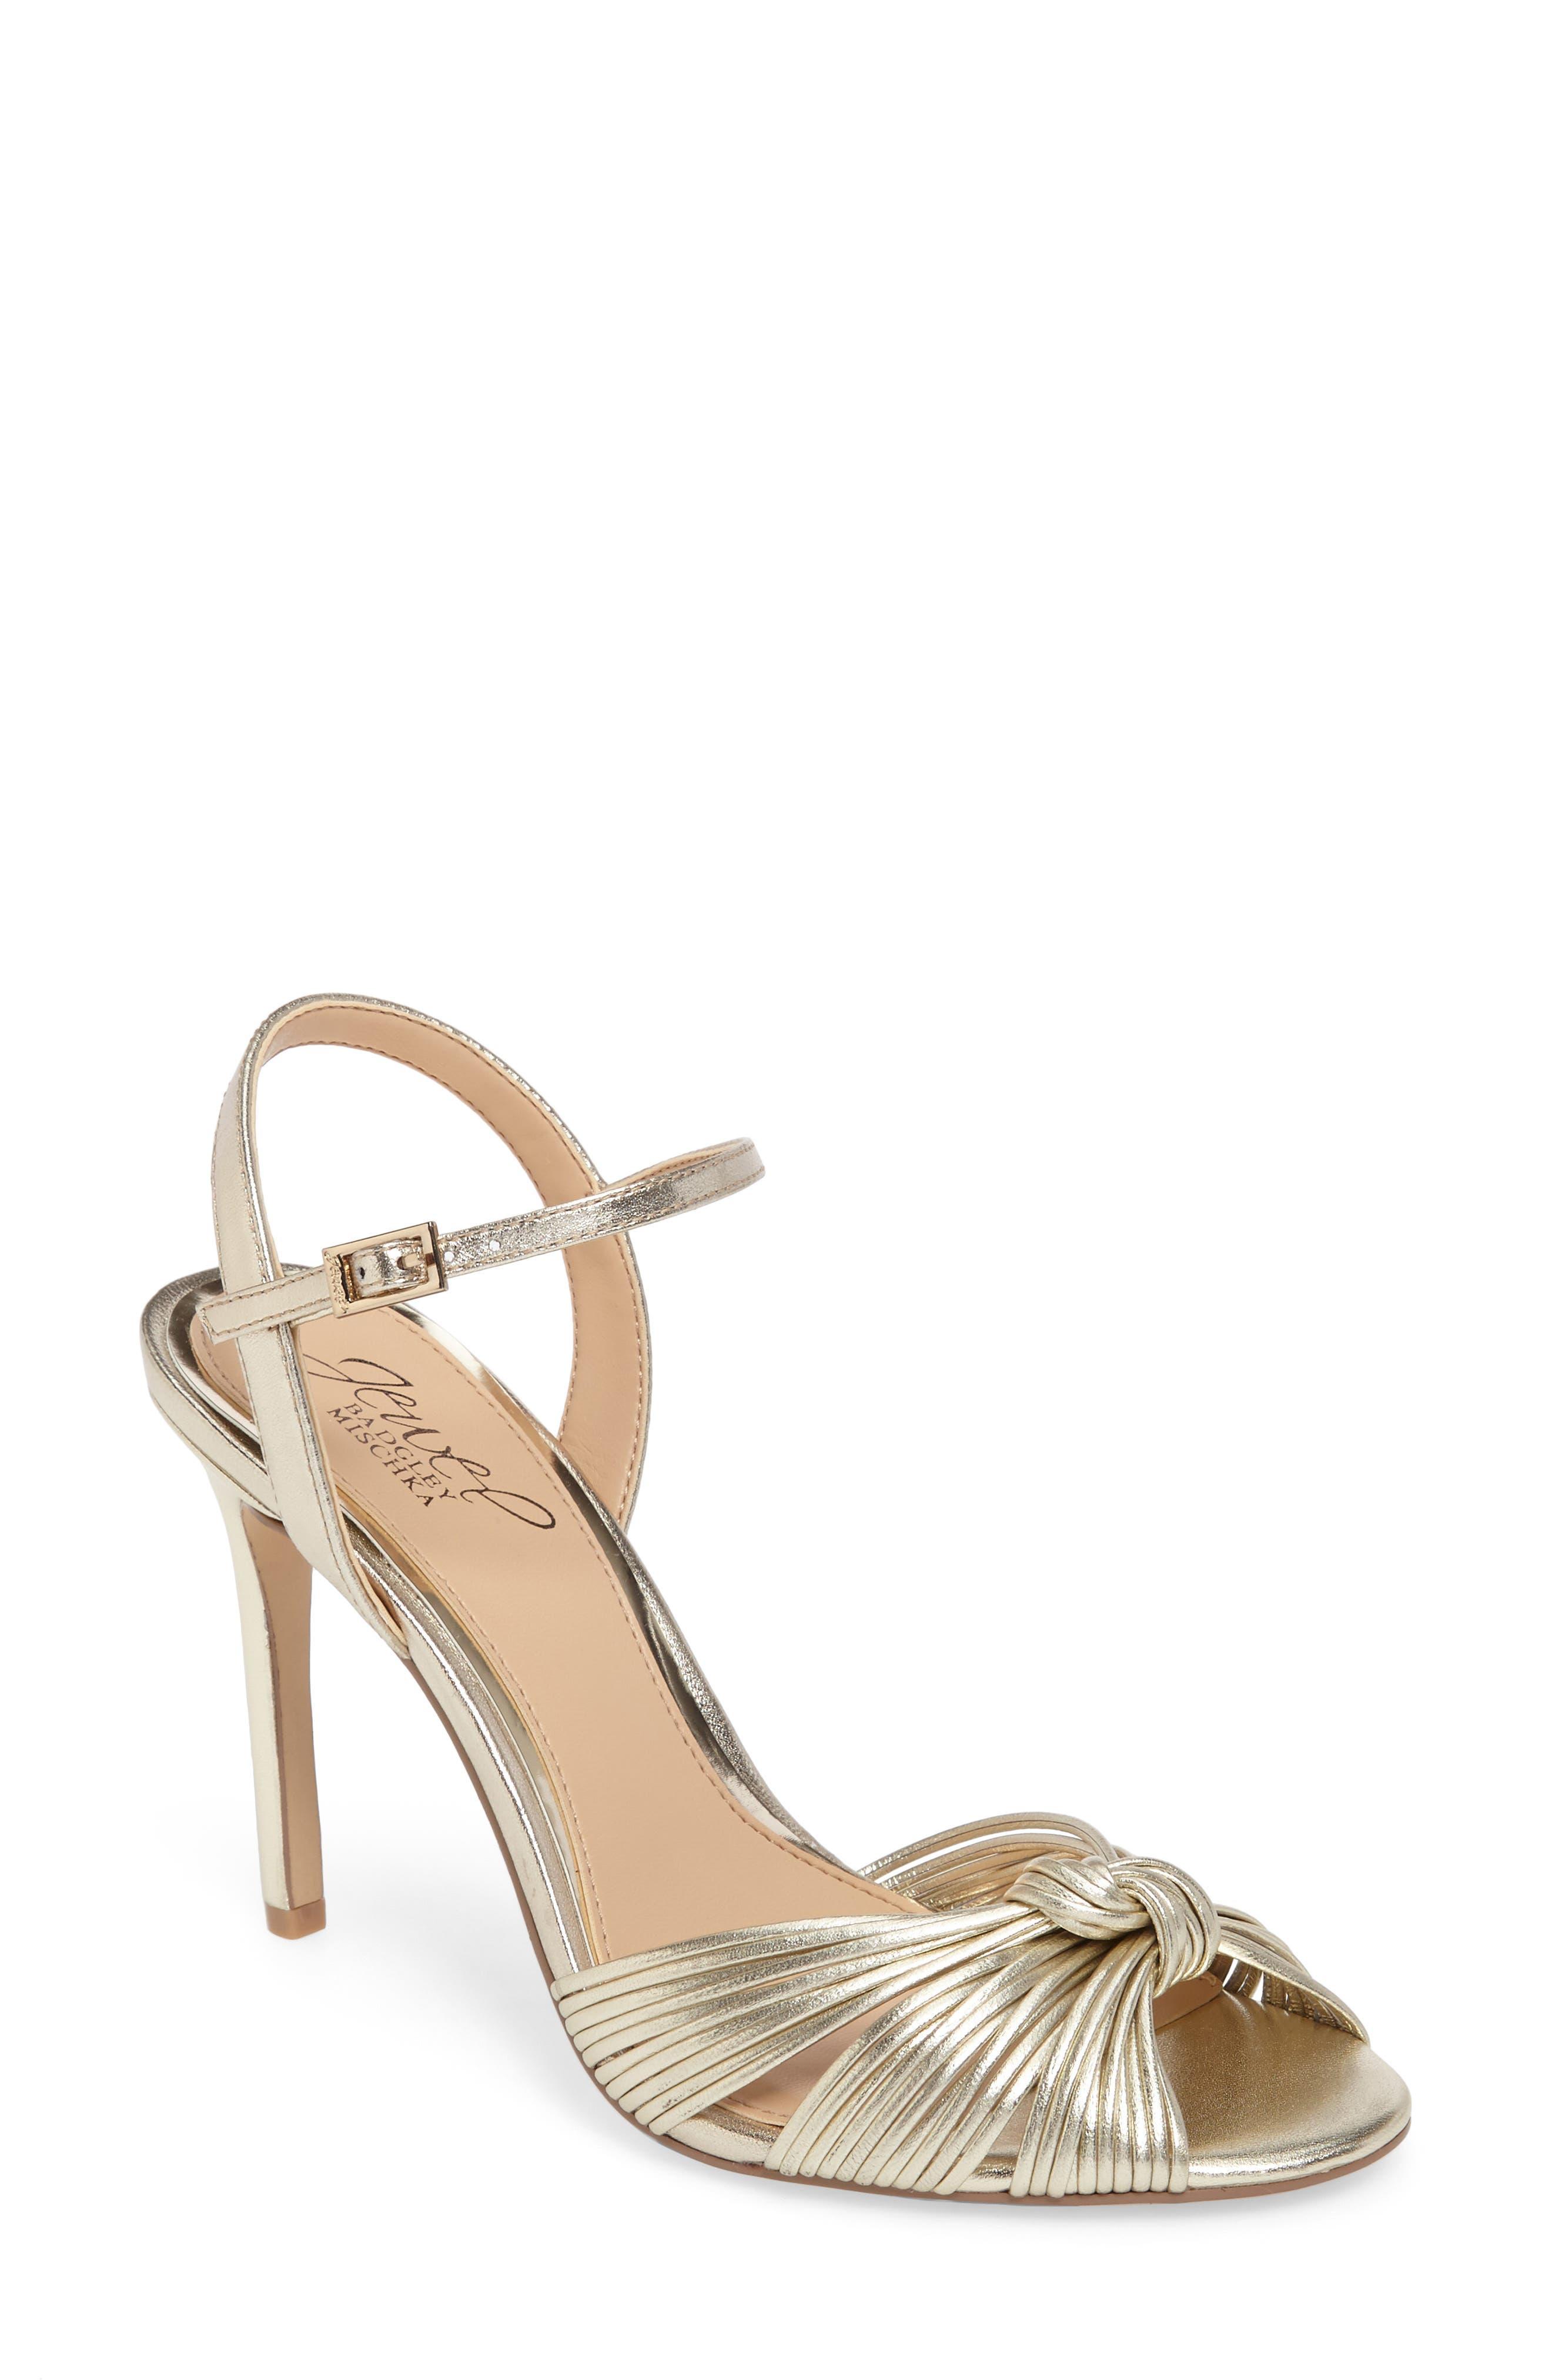 Alternate Image 1 Selected - Jewel Badgley Mischka Lady Ankle Strap Sandal (Women)